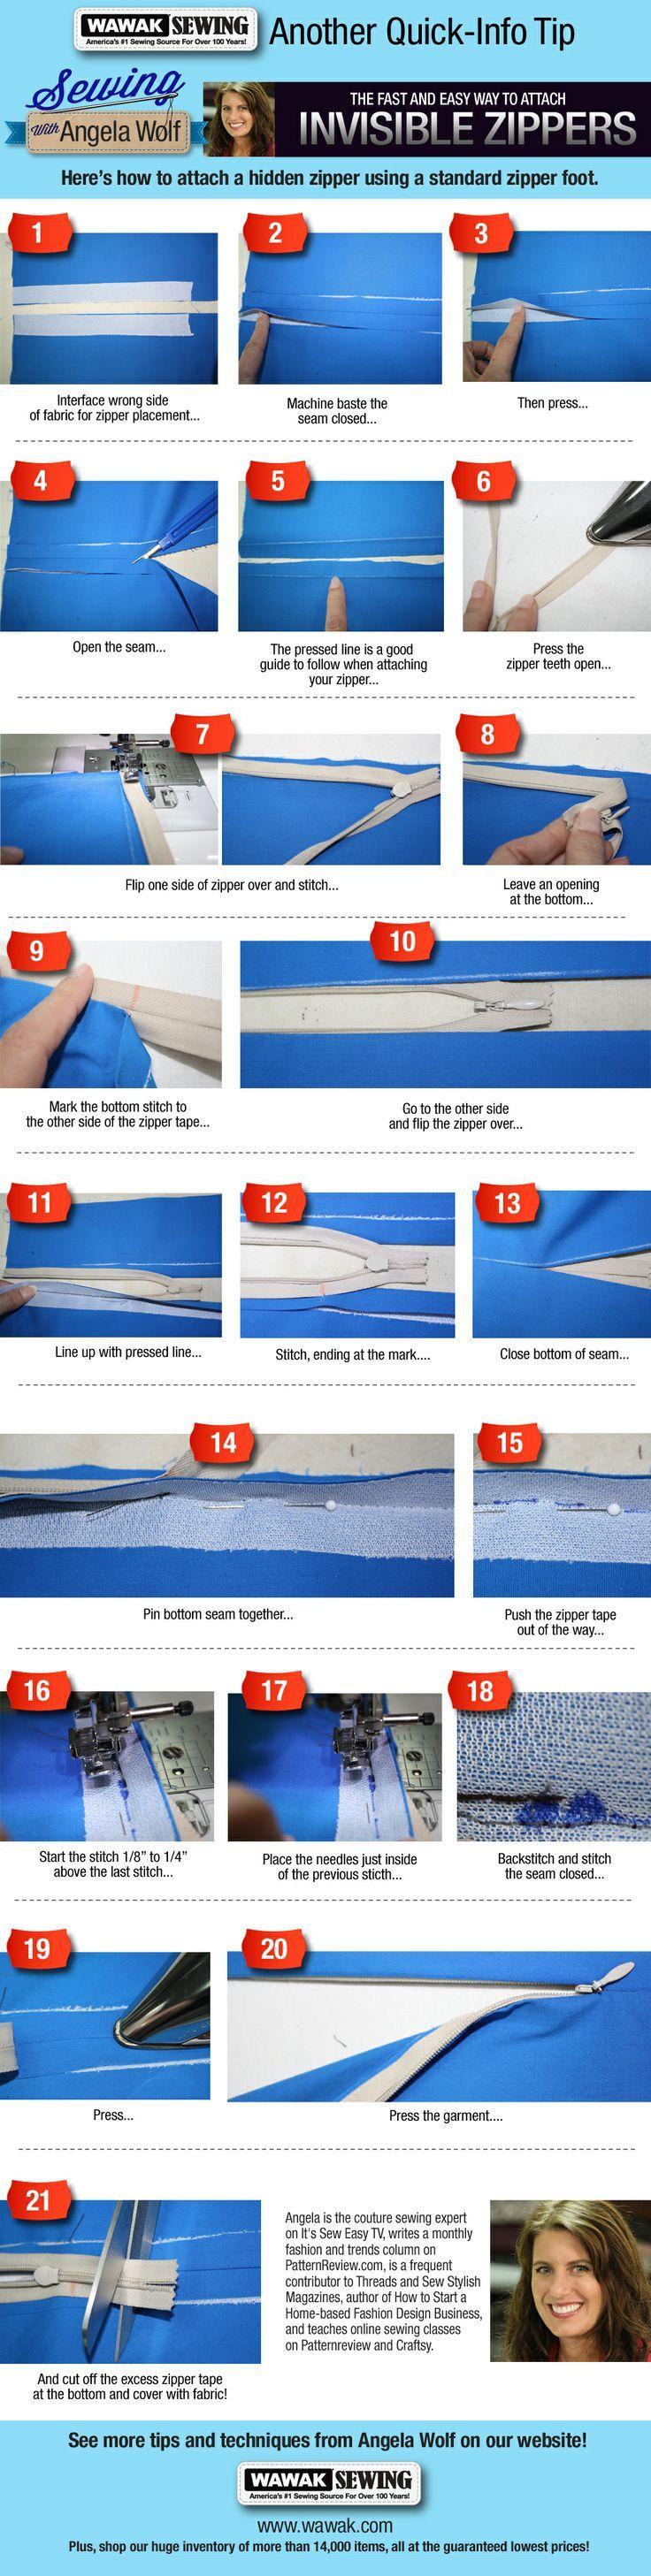 How To Attach A Hidden Zipper With A Standard Zipper Foot | WAWAK Sewing Supplies | Sewing With Angela Wolf